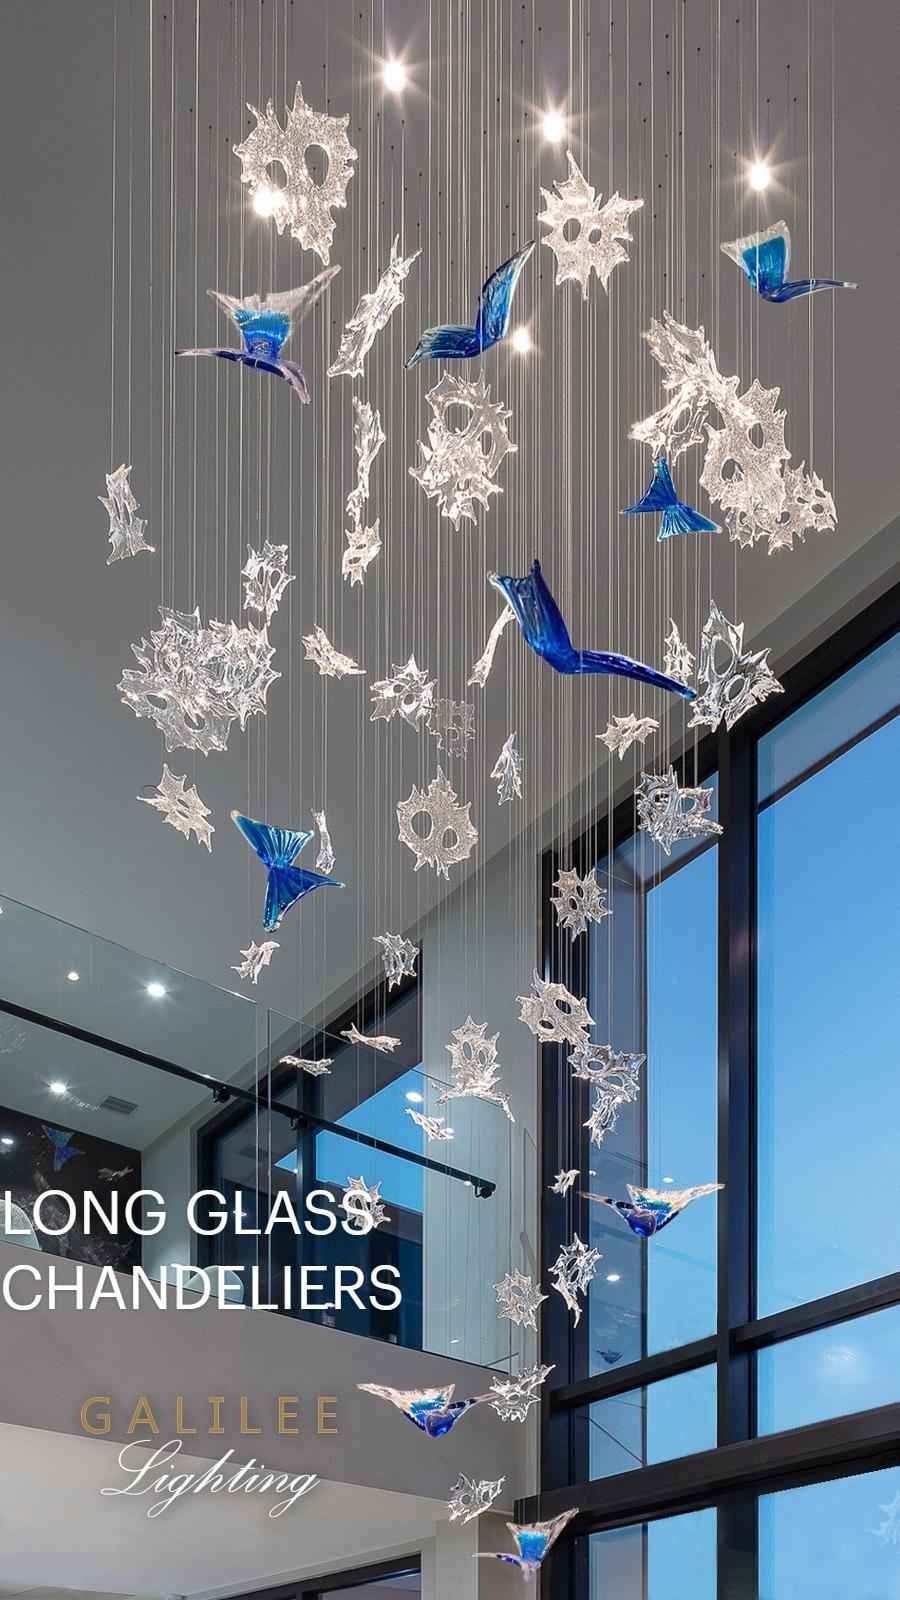 LONG GLASS CHANDELIERS